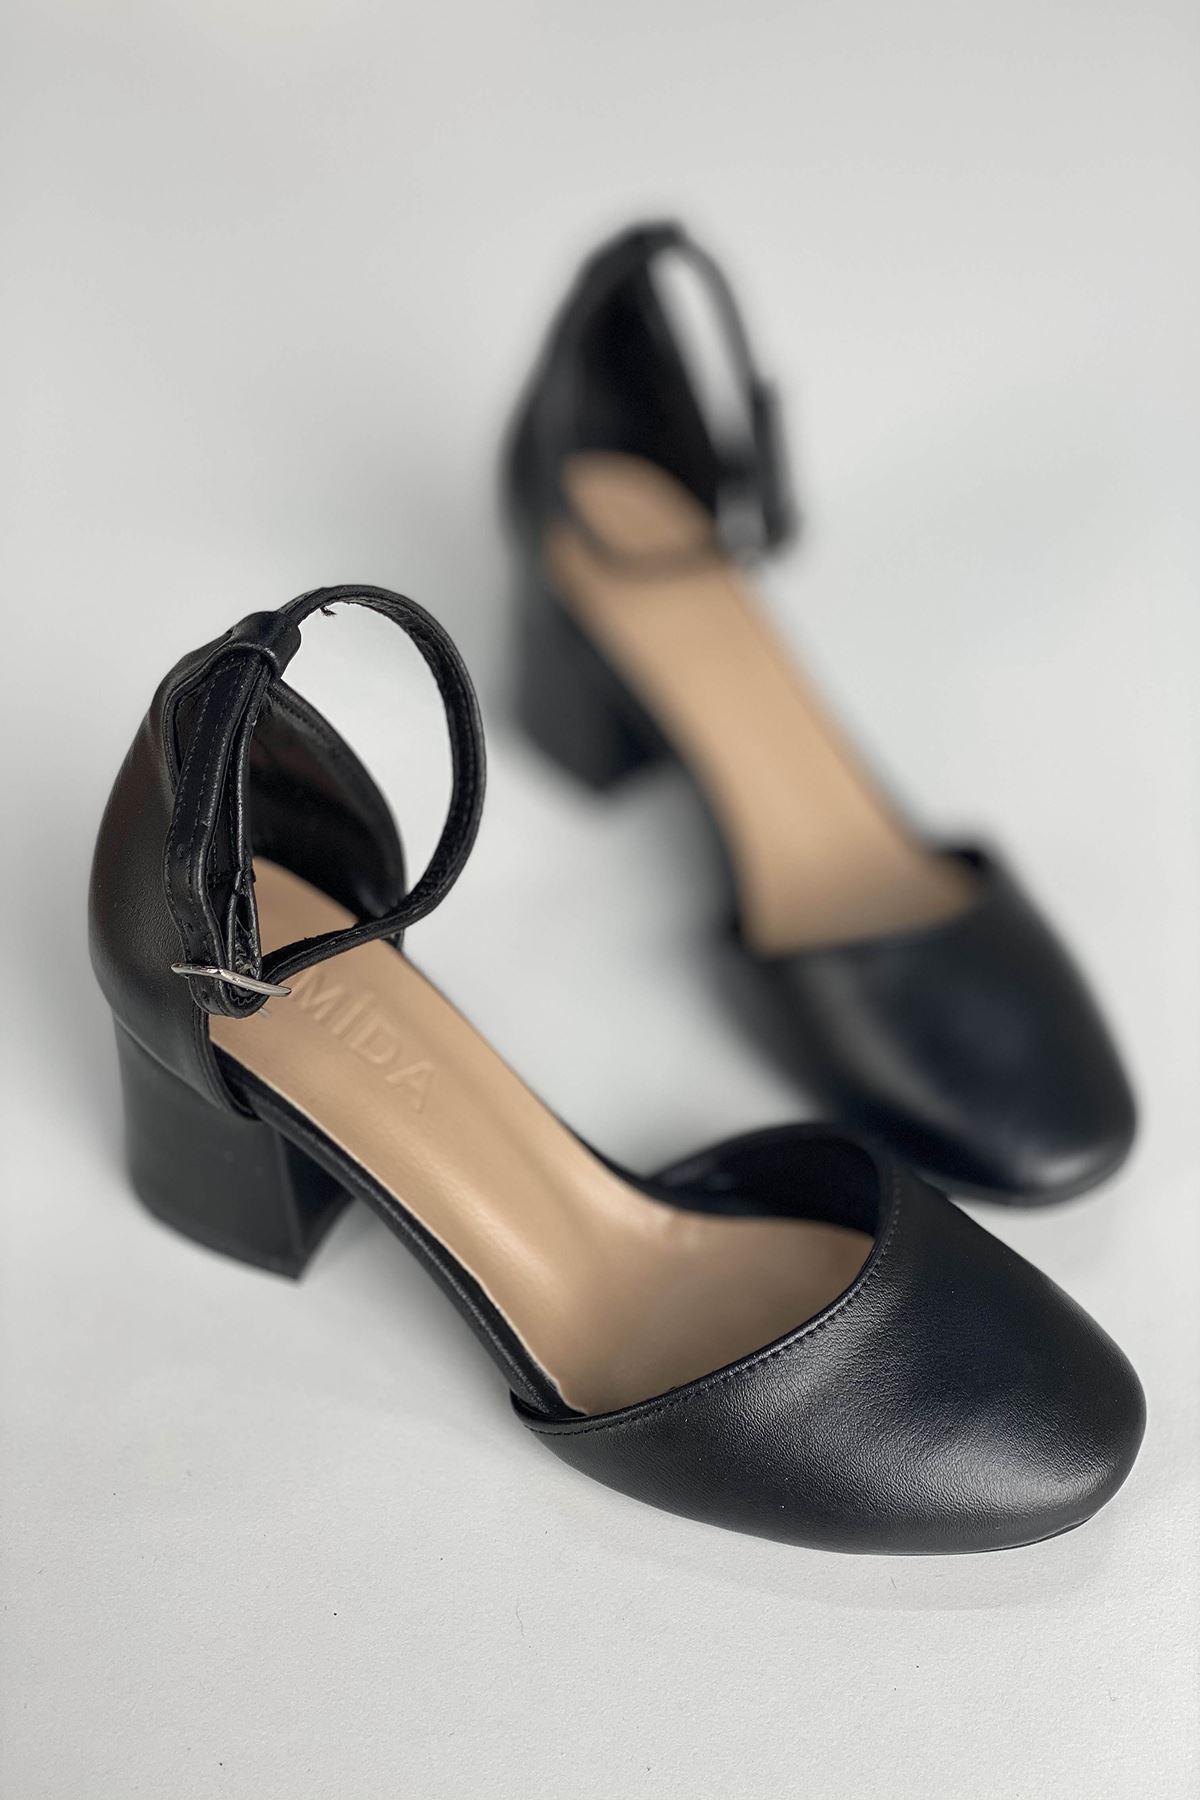 Y202 Siyah Deri Topuklu Ayakkabı